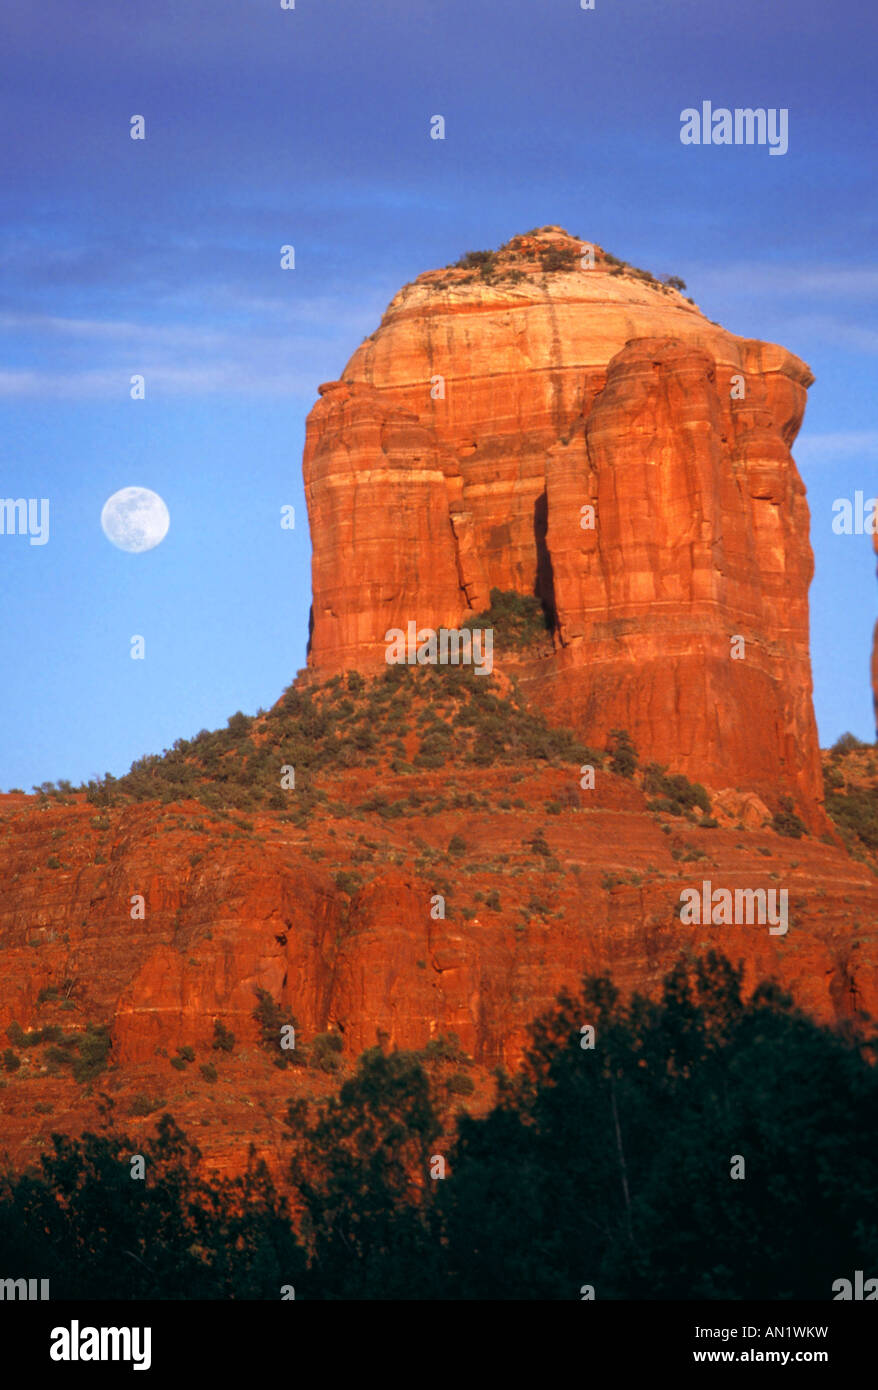 Castle Rock Moonrise Sedona Arizona USA - Stock Image